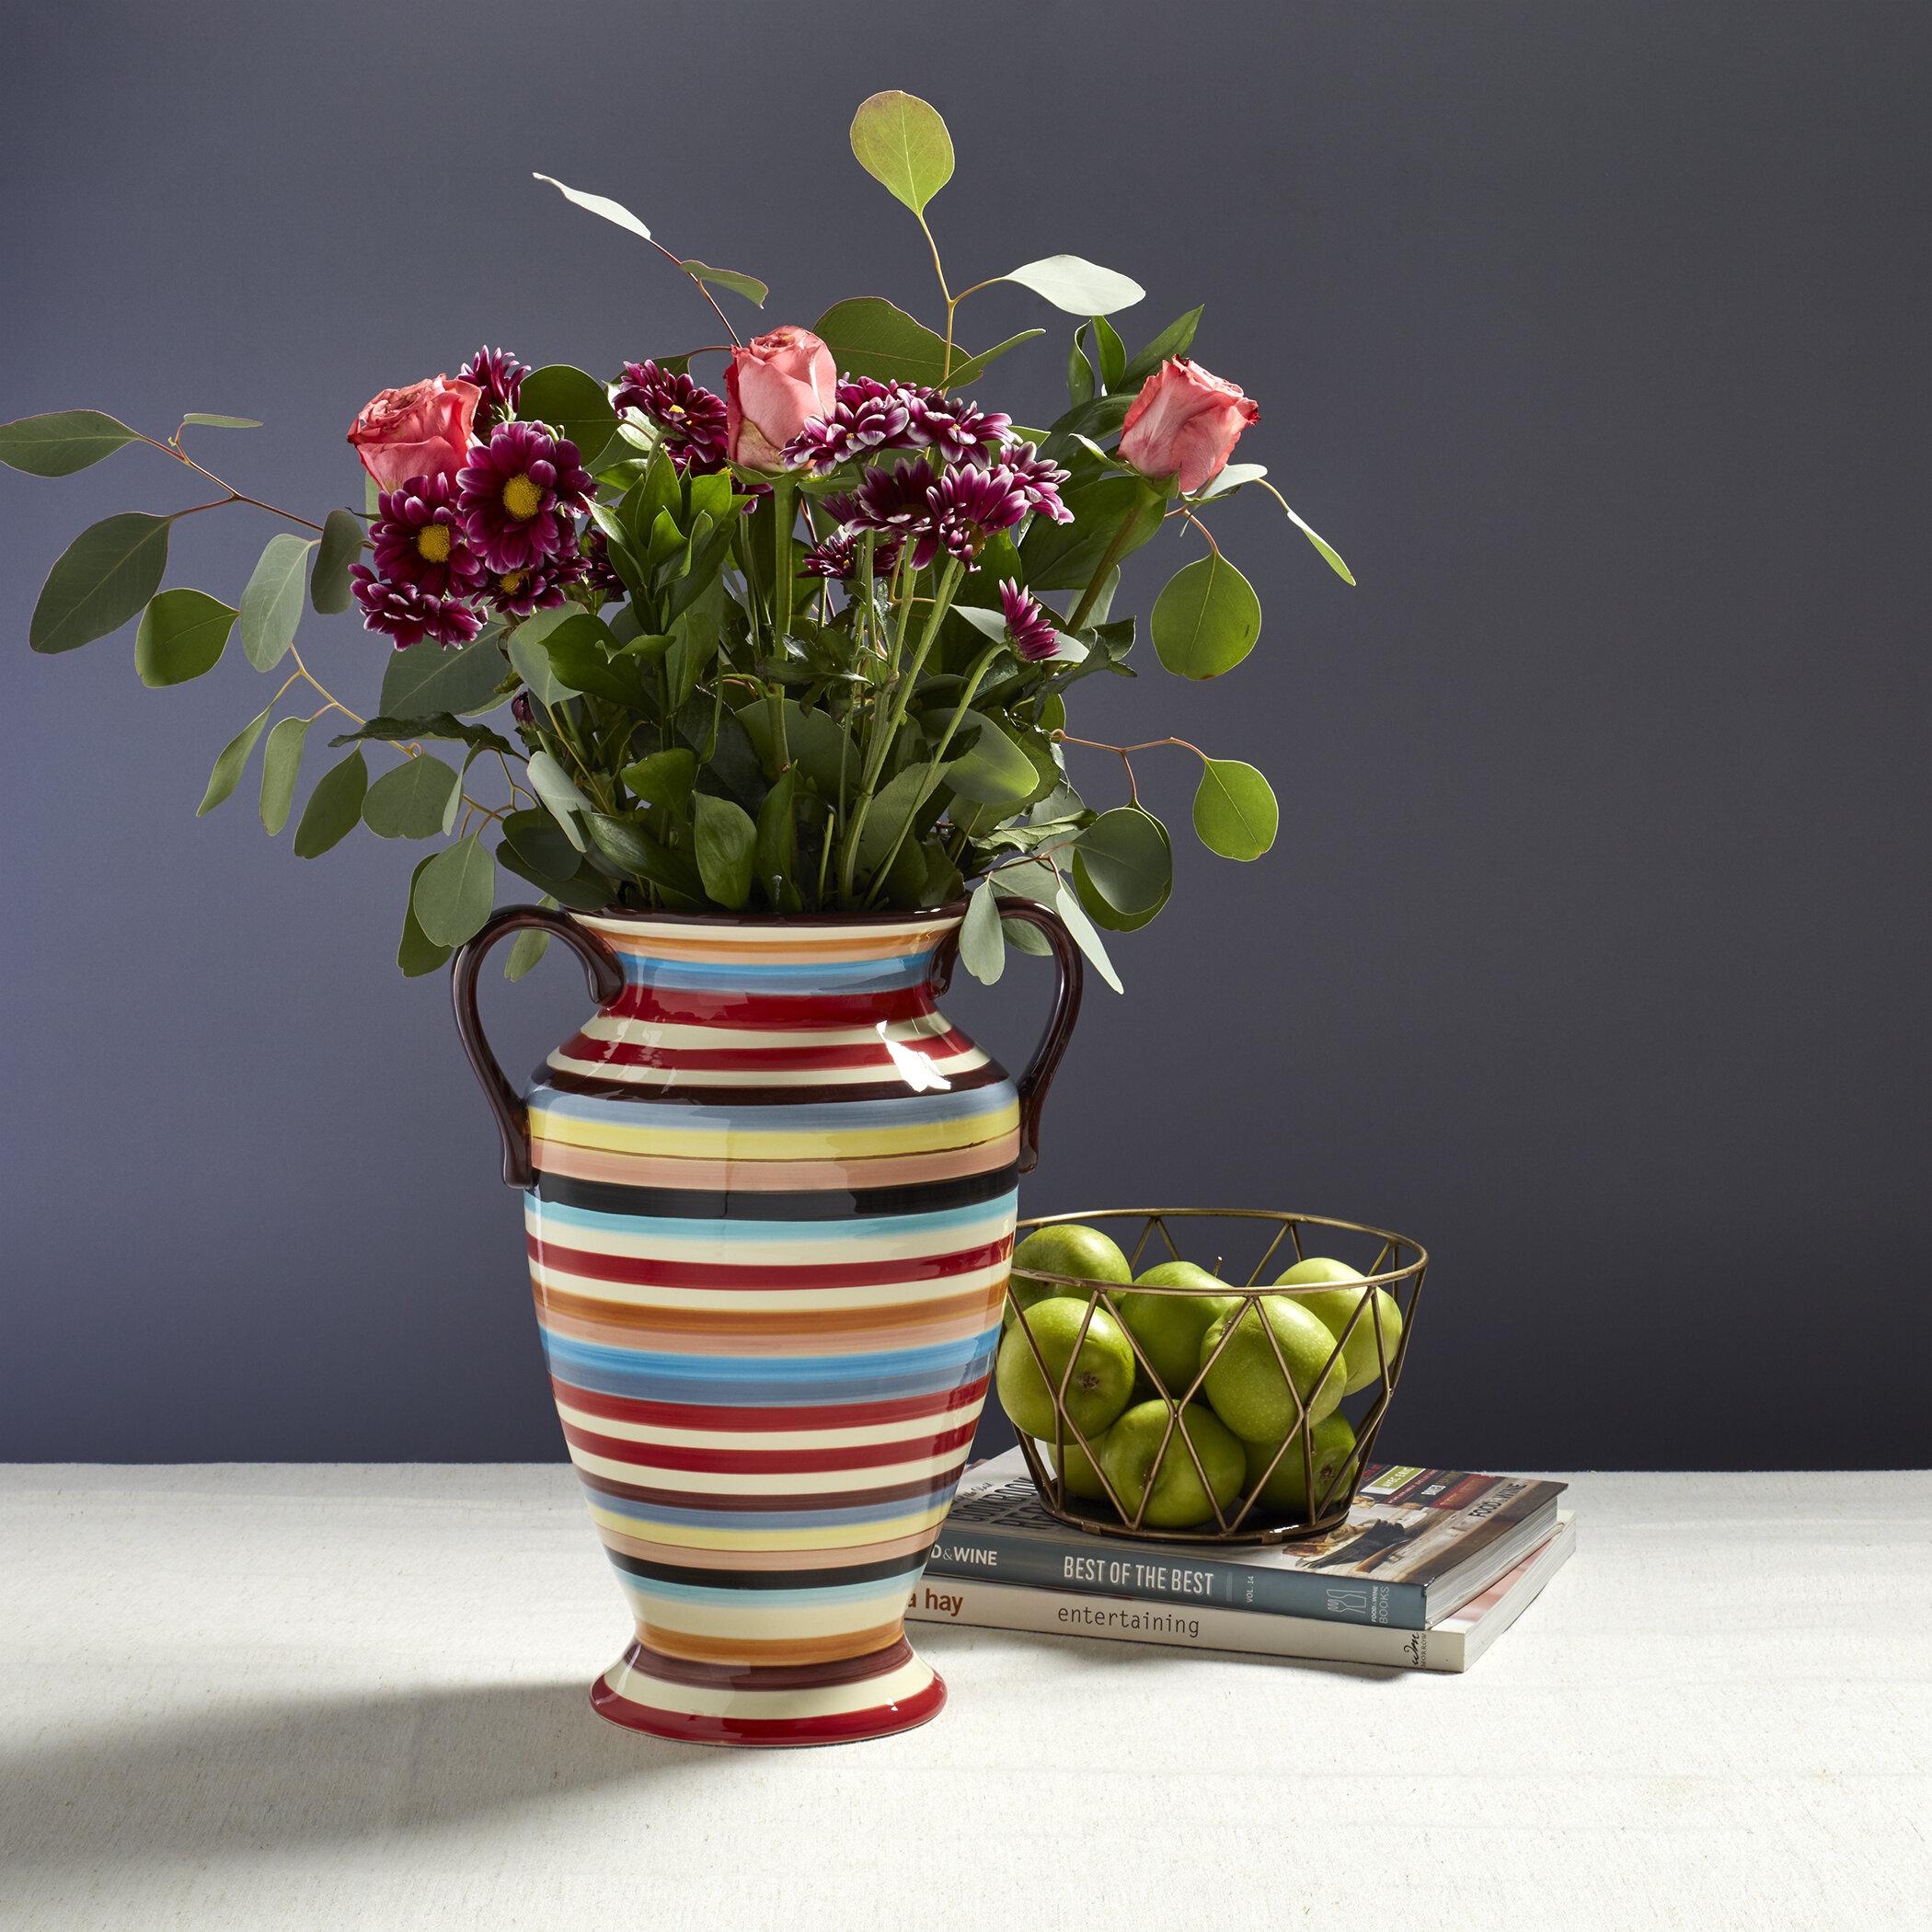 Earthenware Vases Urns Jars Bottles You Ll Love In 2021 Wayfair